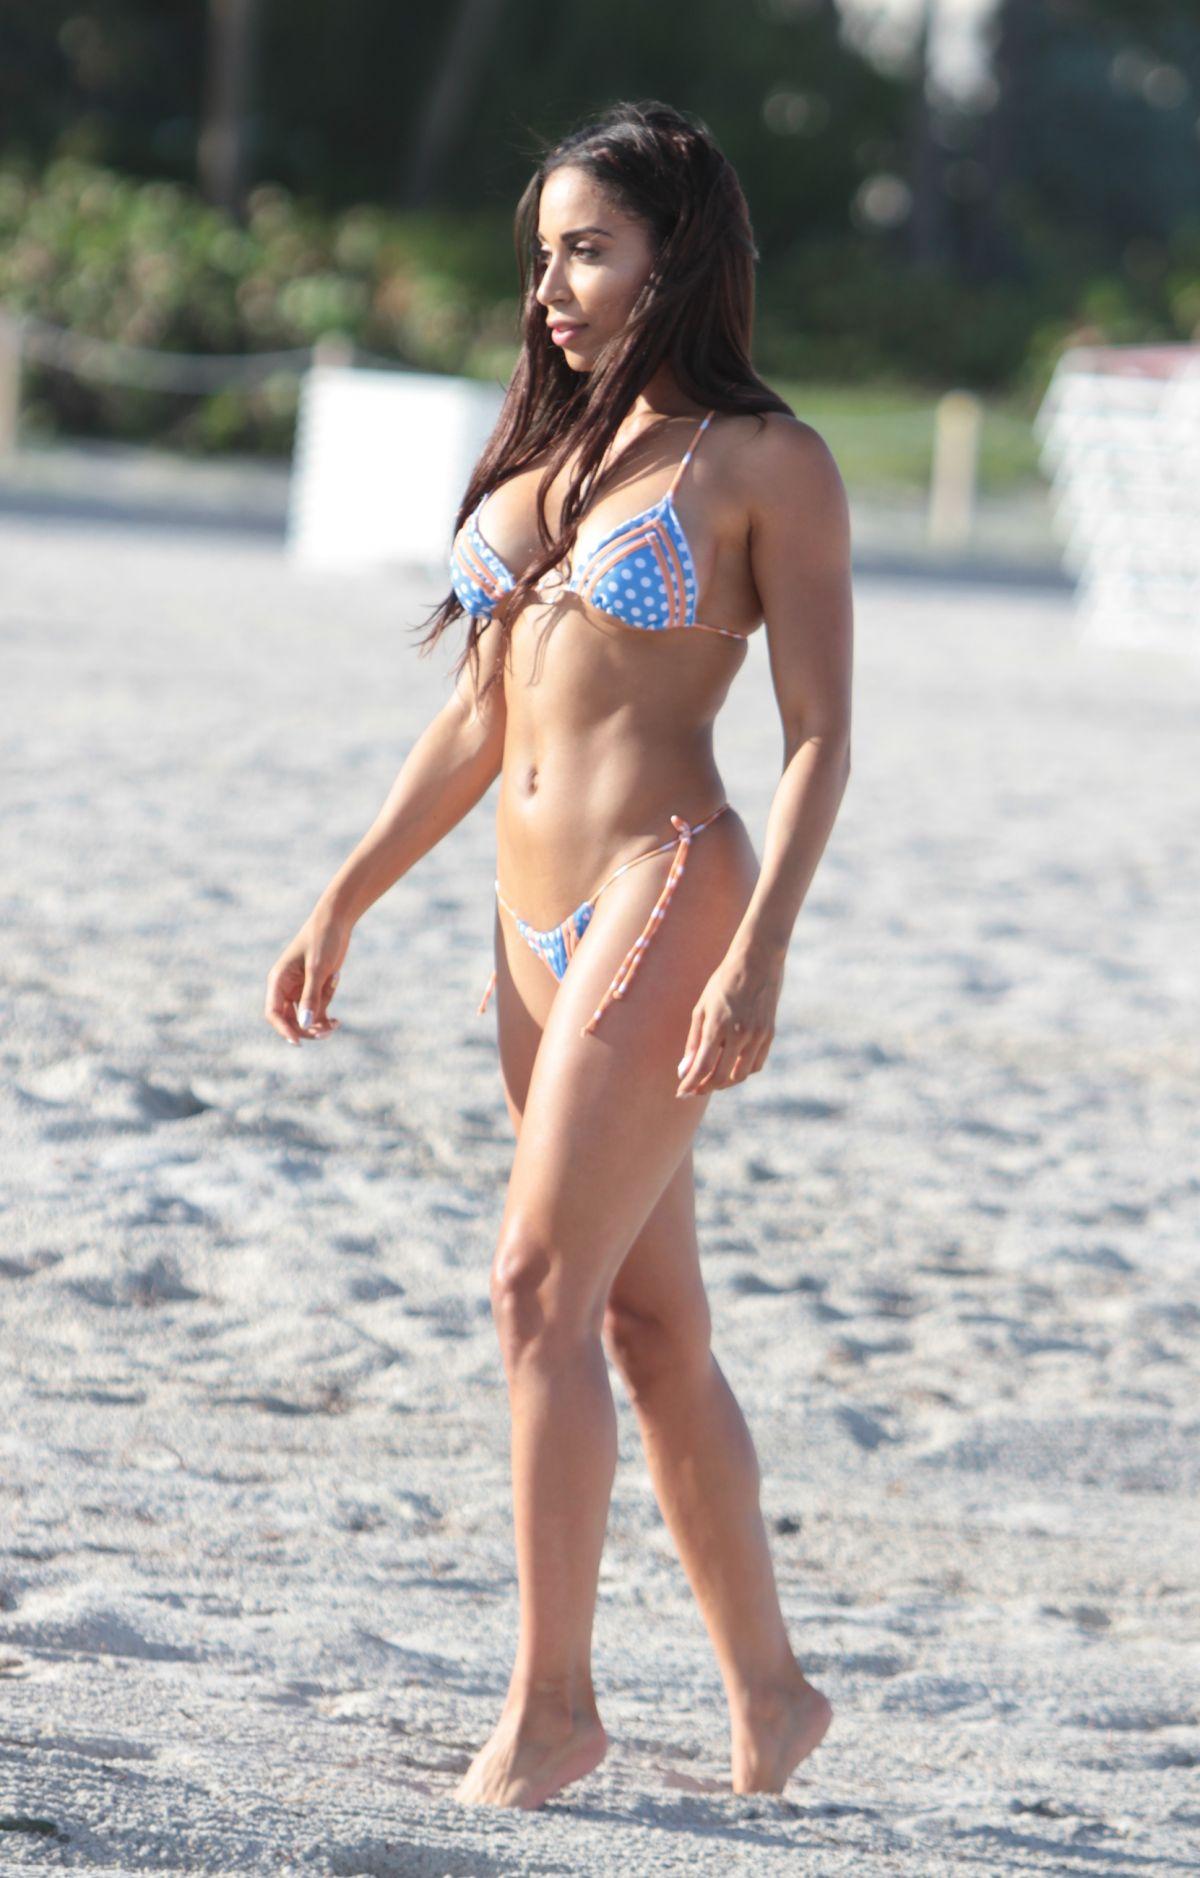 2019 Sophia Leger Valere nudes (89 photos), Sexy, Bikini, Selfie, bra 2020